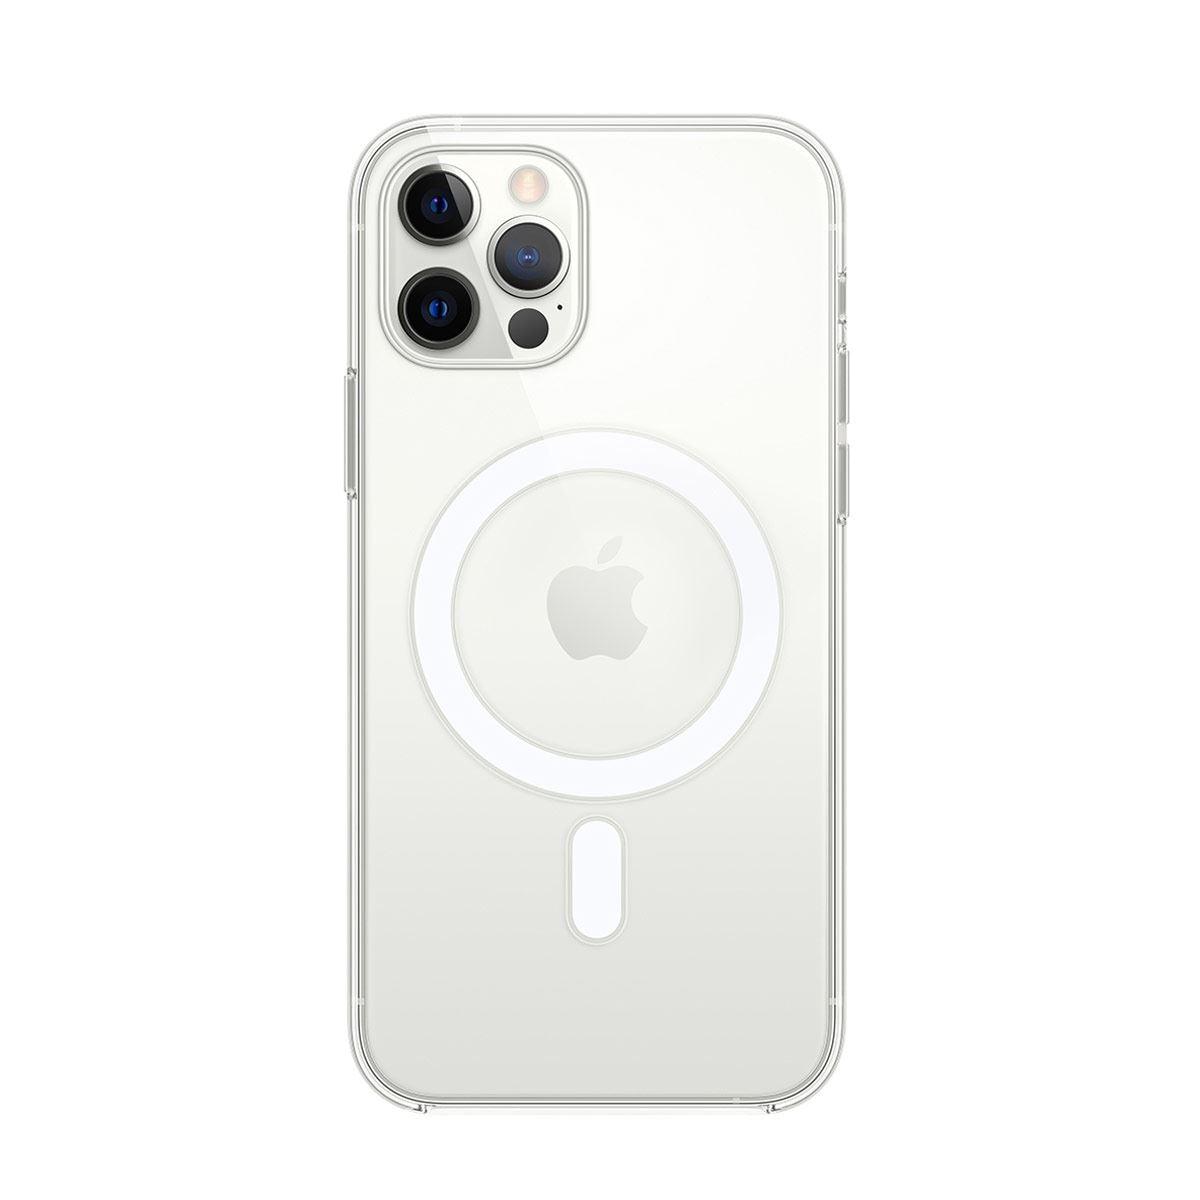 Funda Transparente con MagSafe para iPhone 12-12 Pro